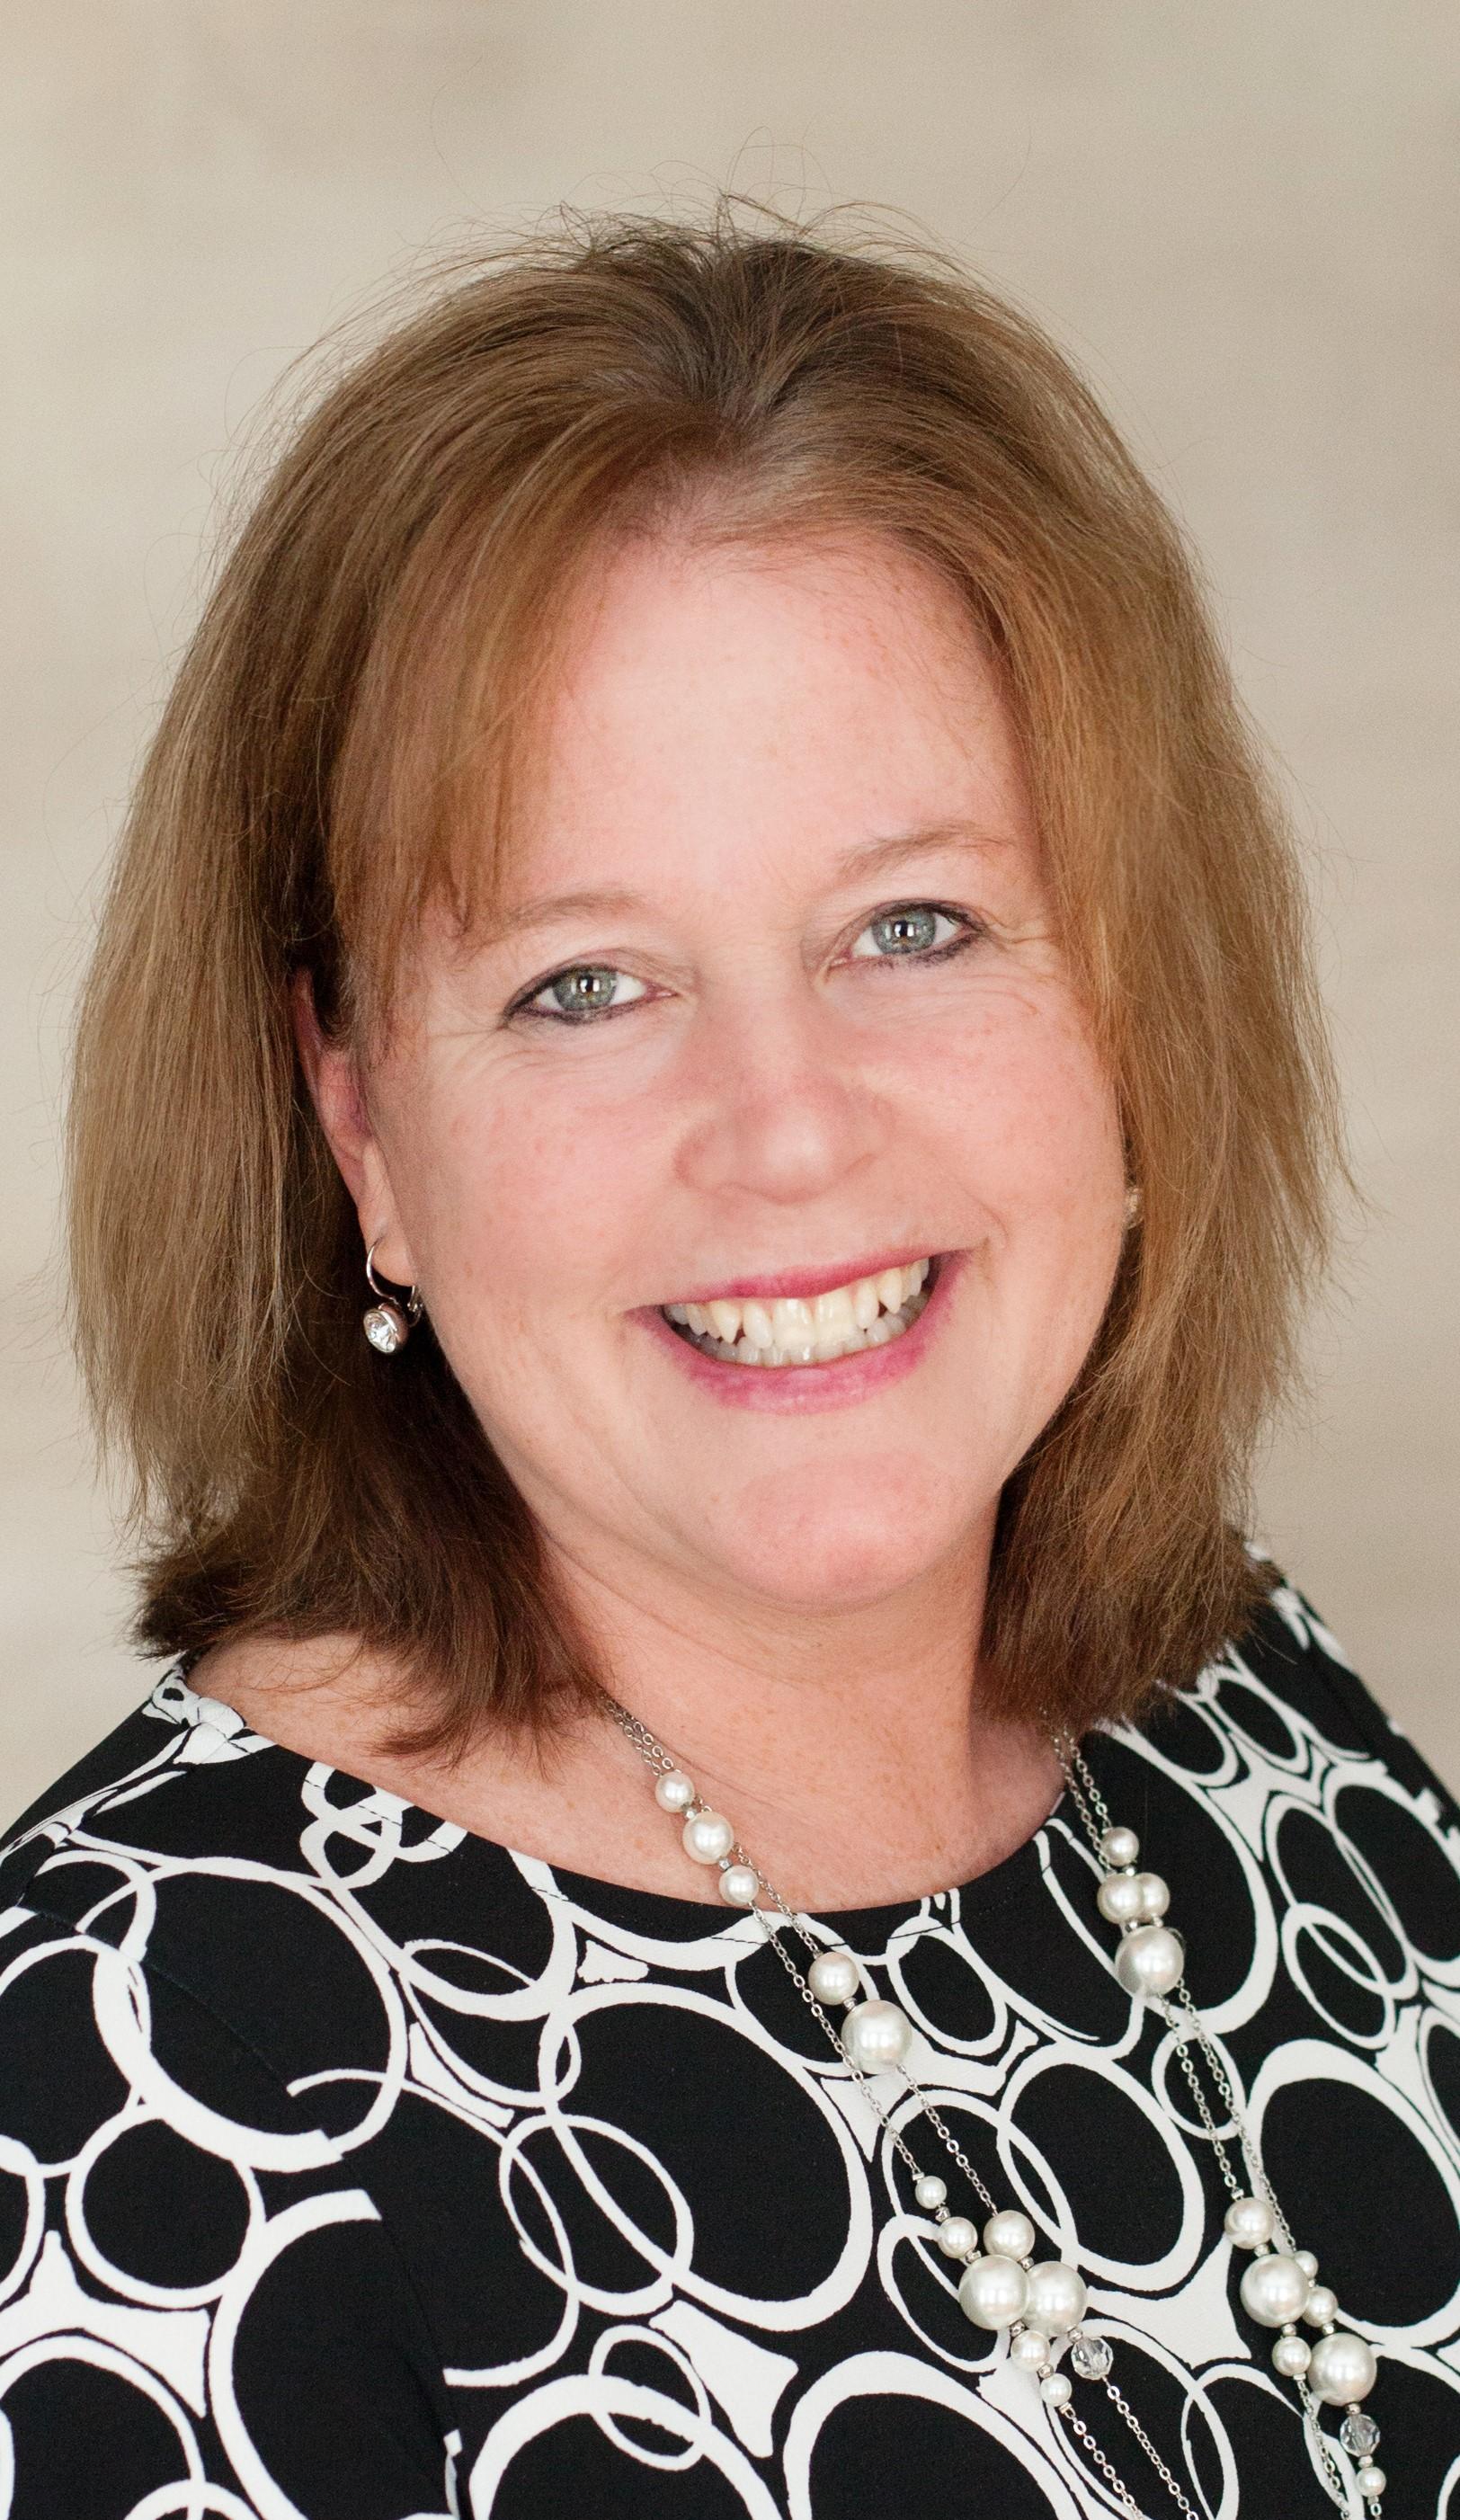 Kathy Bain Farrell